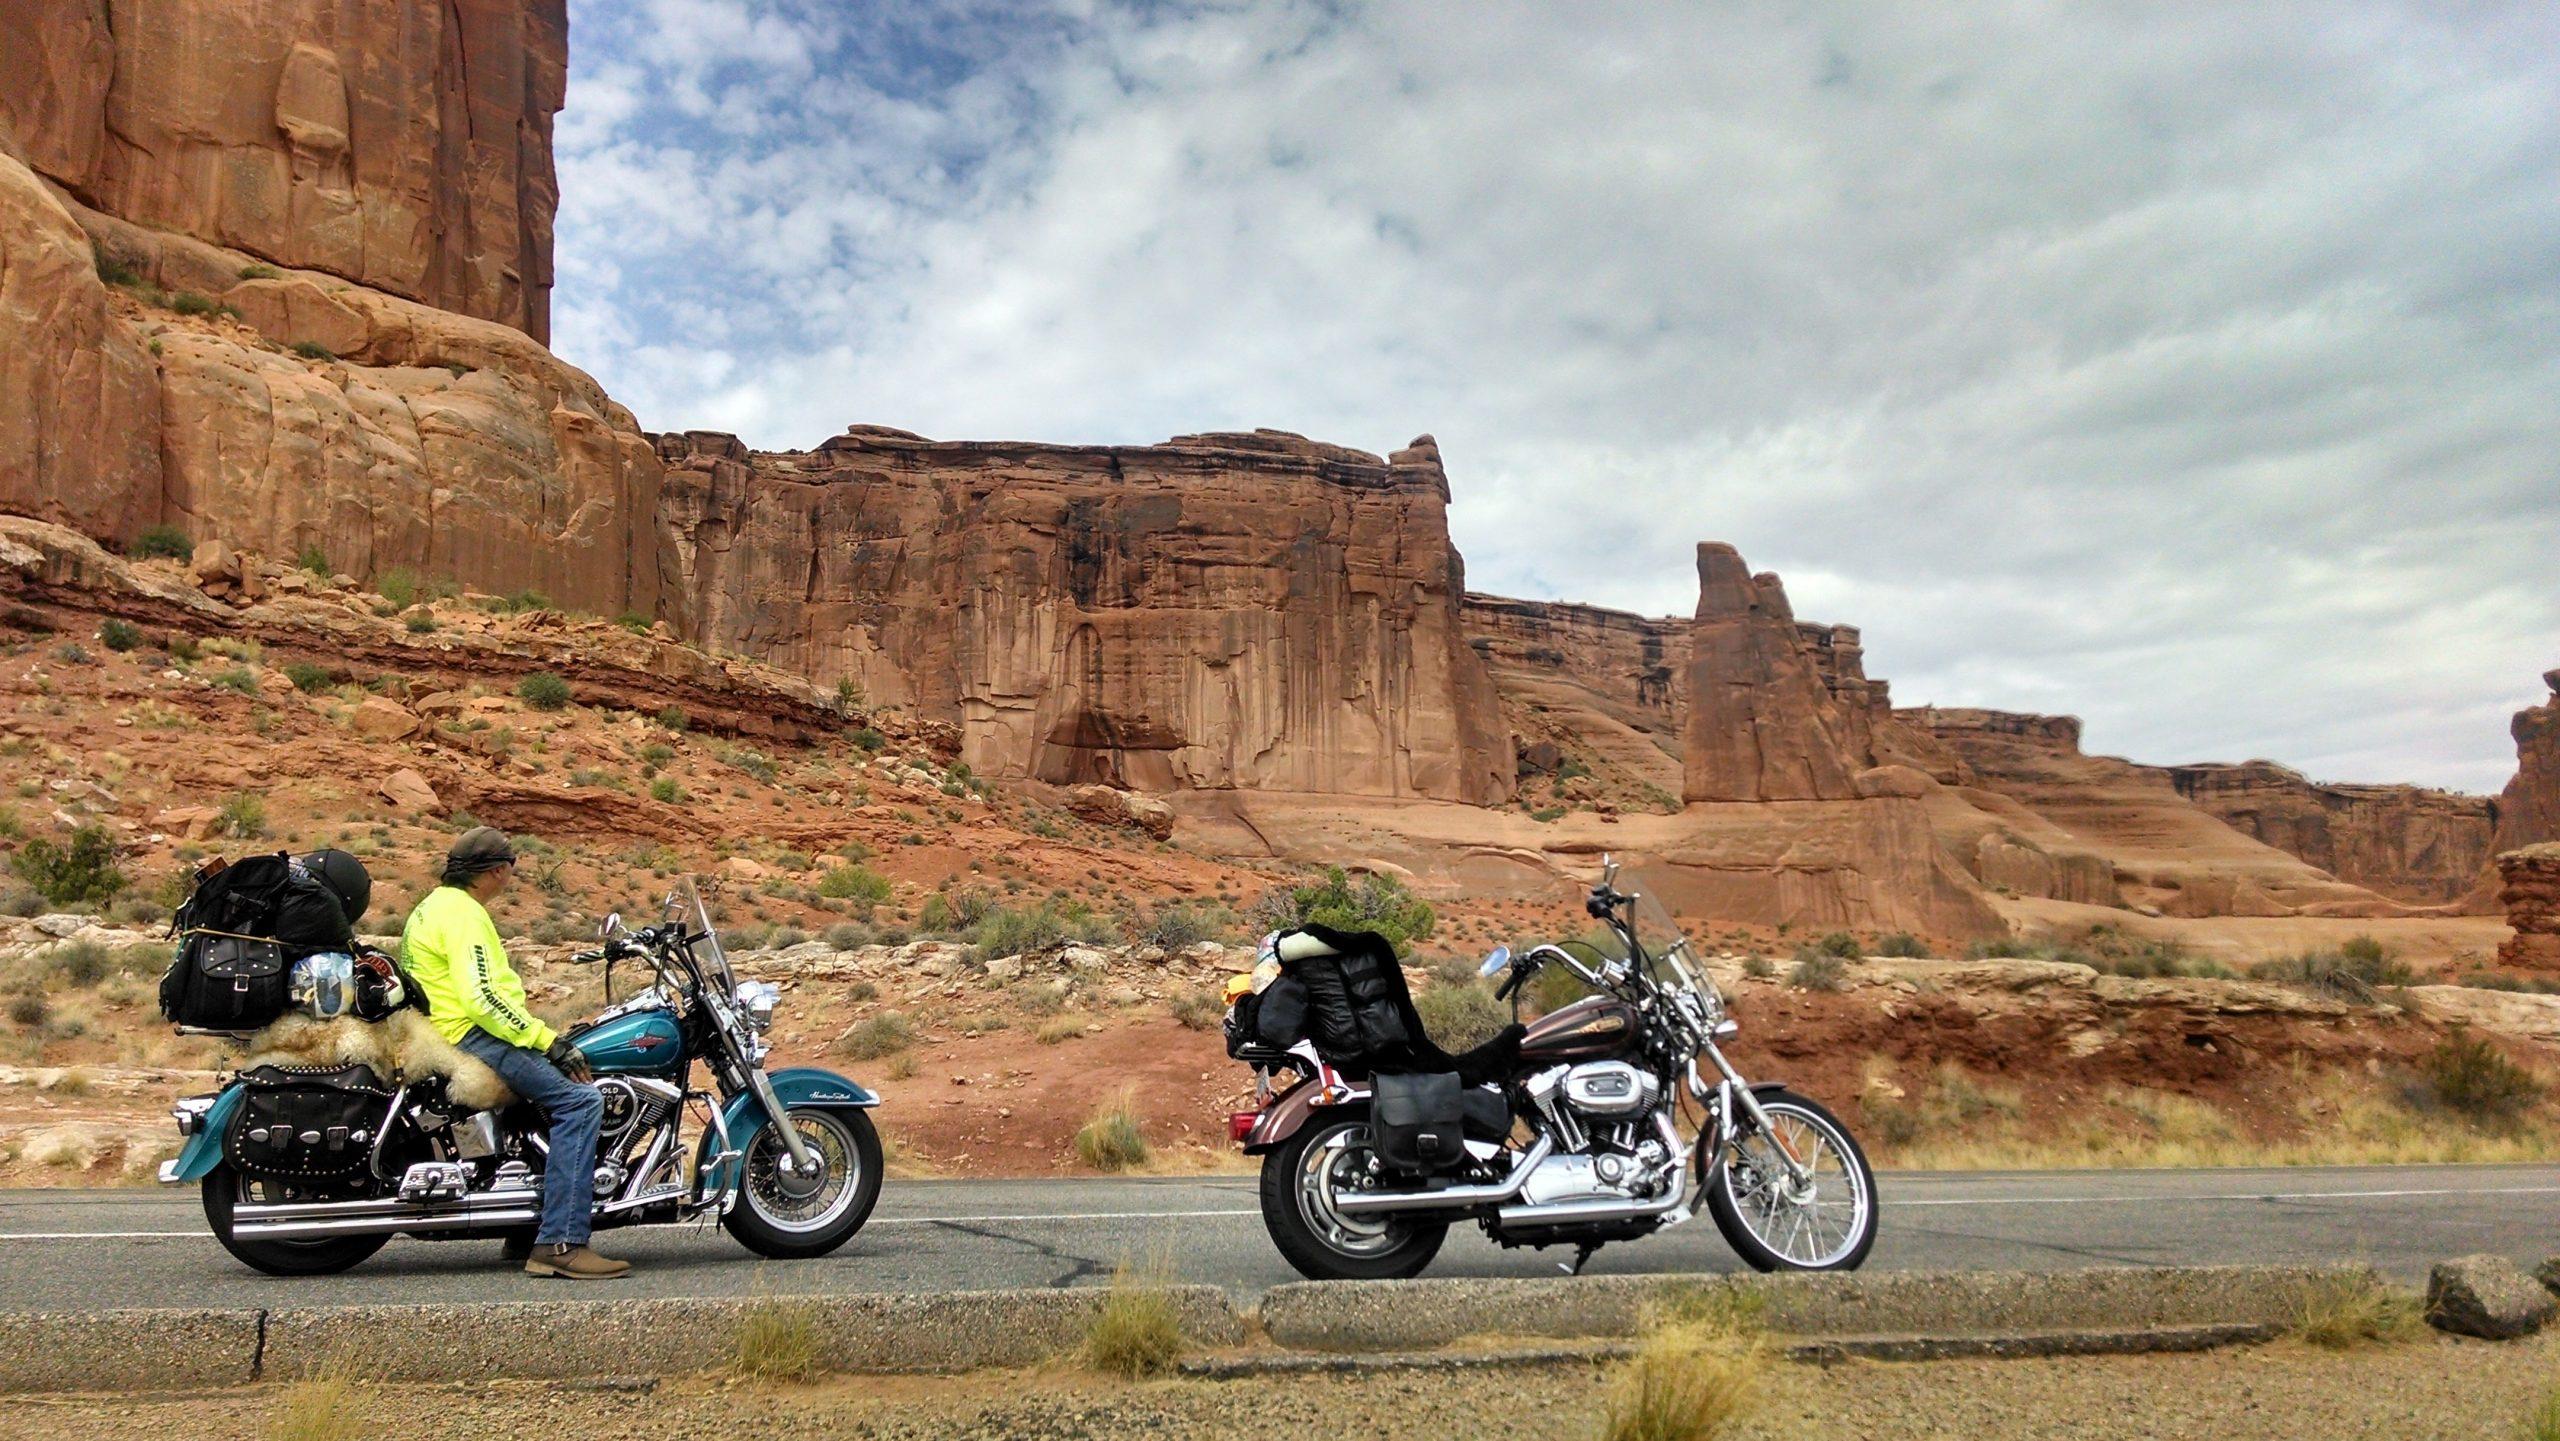 Arizona on the way to the Grand Canyon